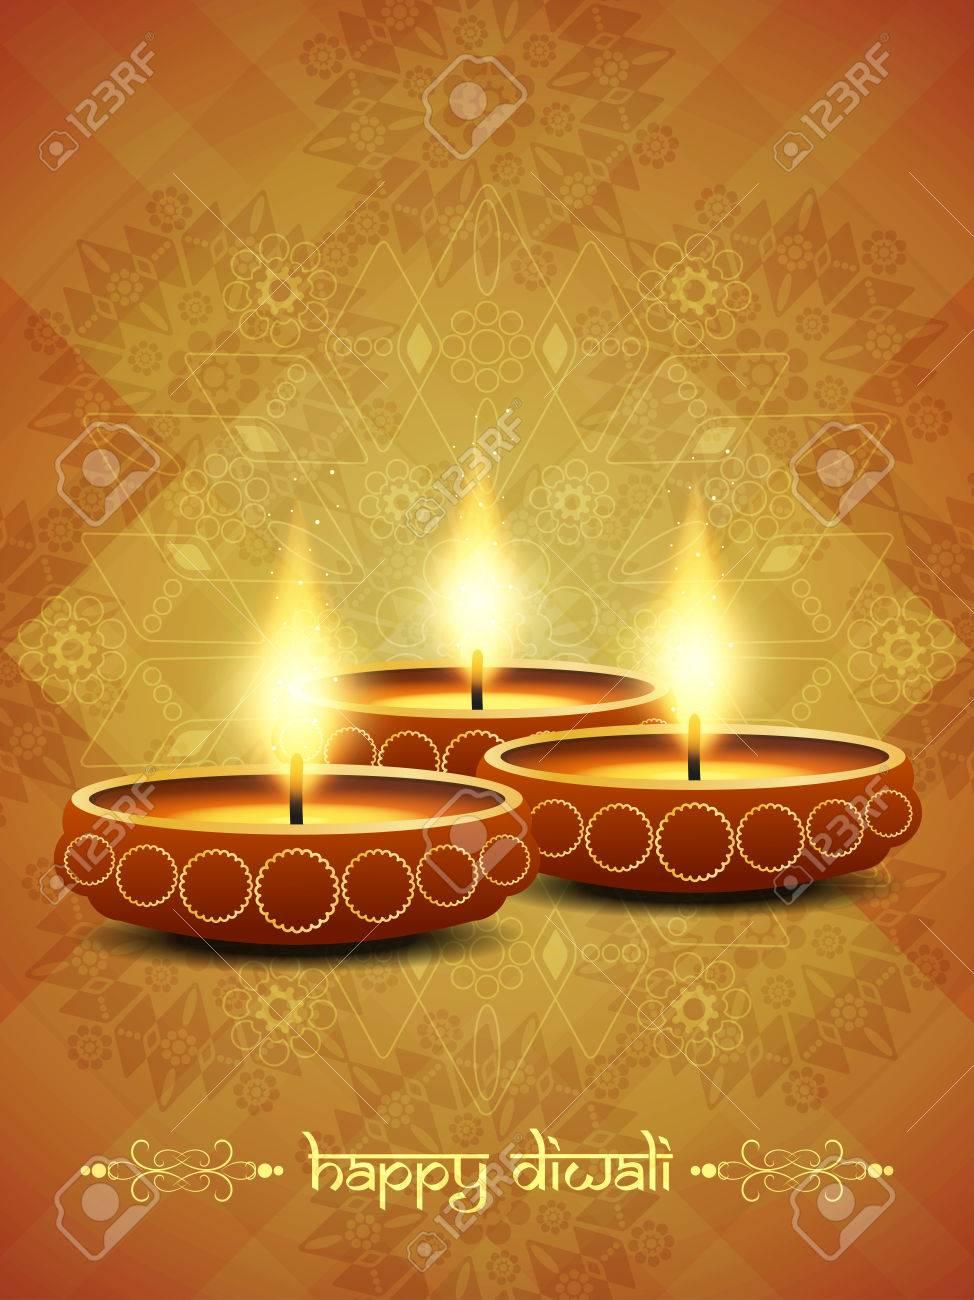 religious background design for Diwali Stock Vector - 22962384